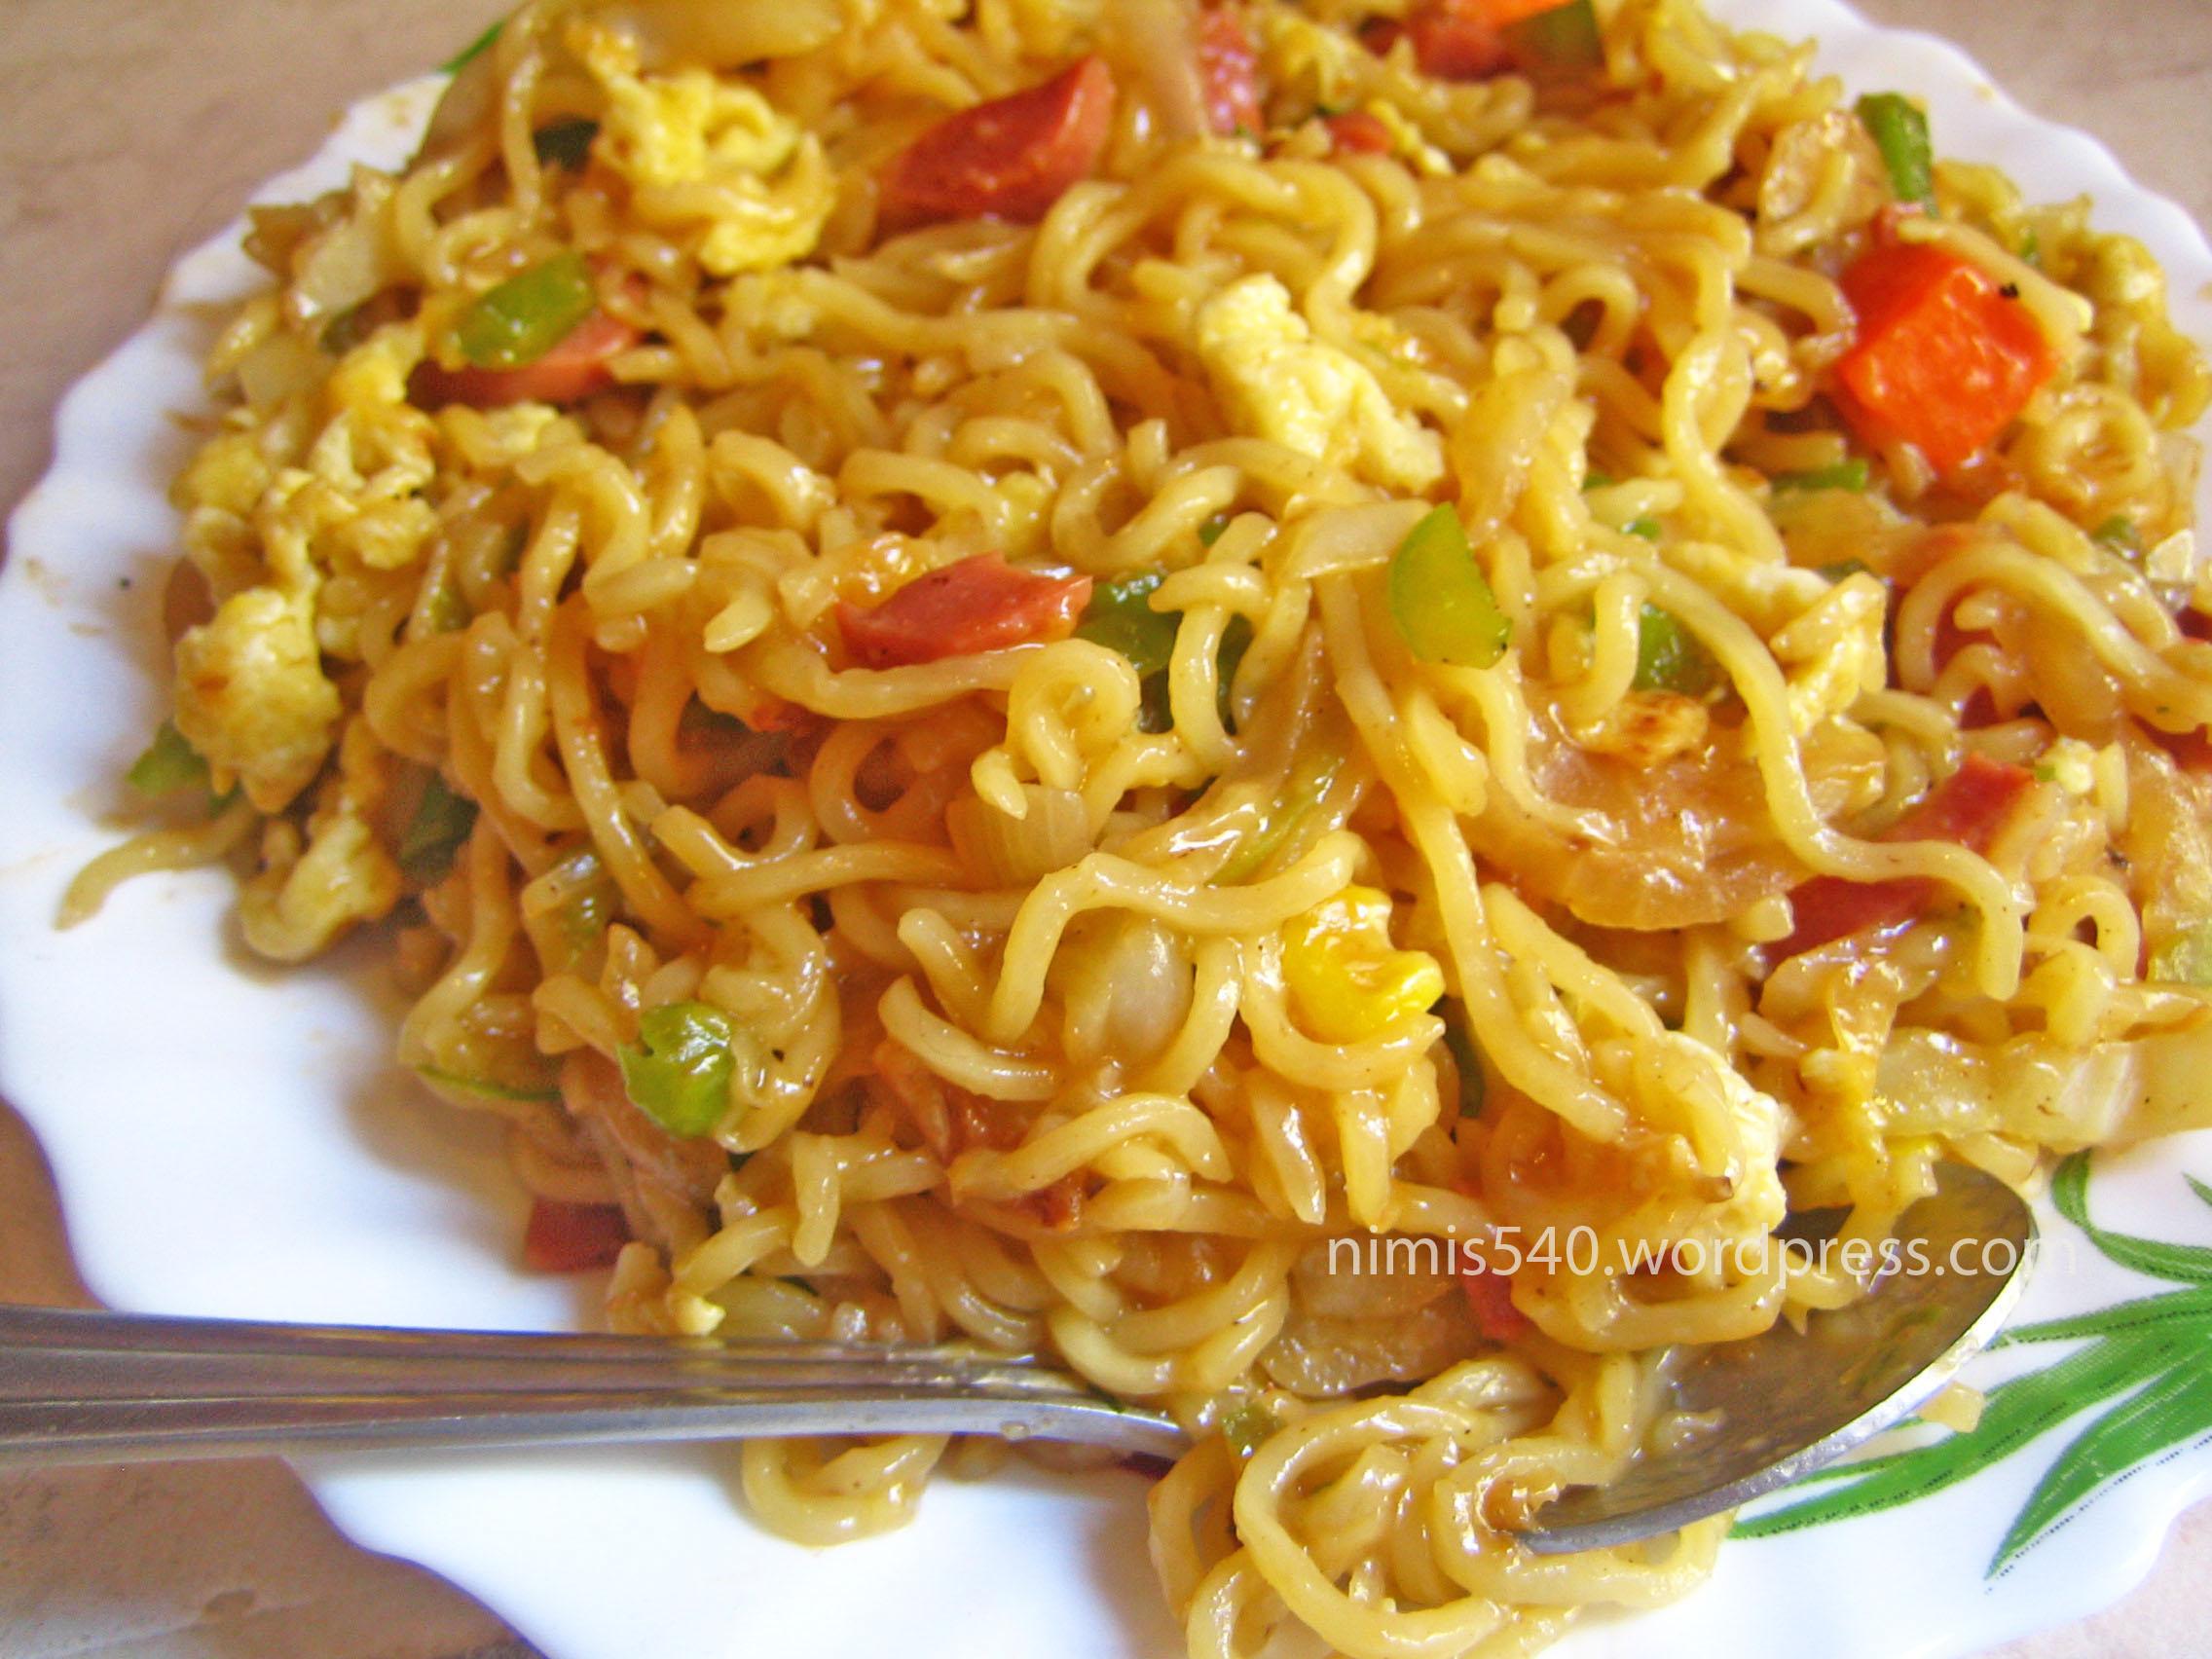 and egg cooking ramen egg Yi cantonese noodle, Mein, mee, noodle, Yee, fried Fu, Yee noodles